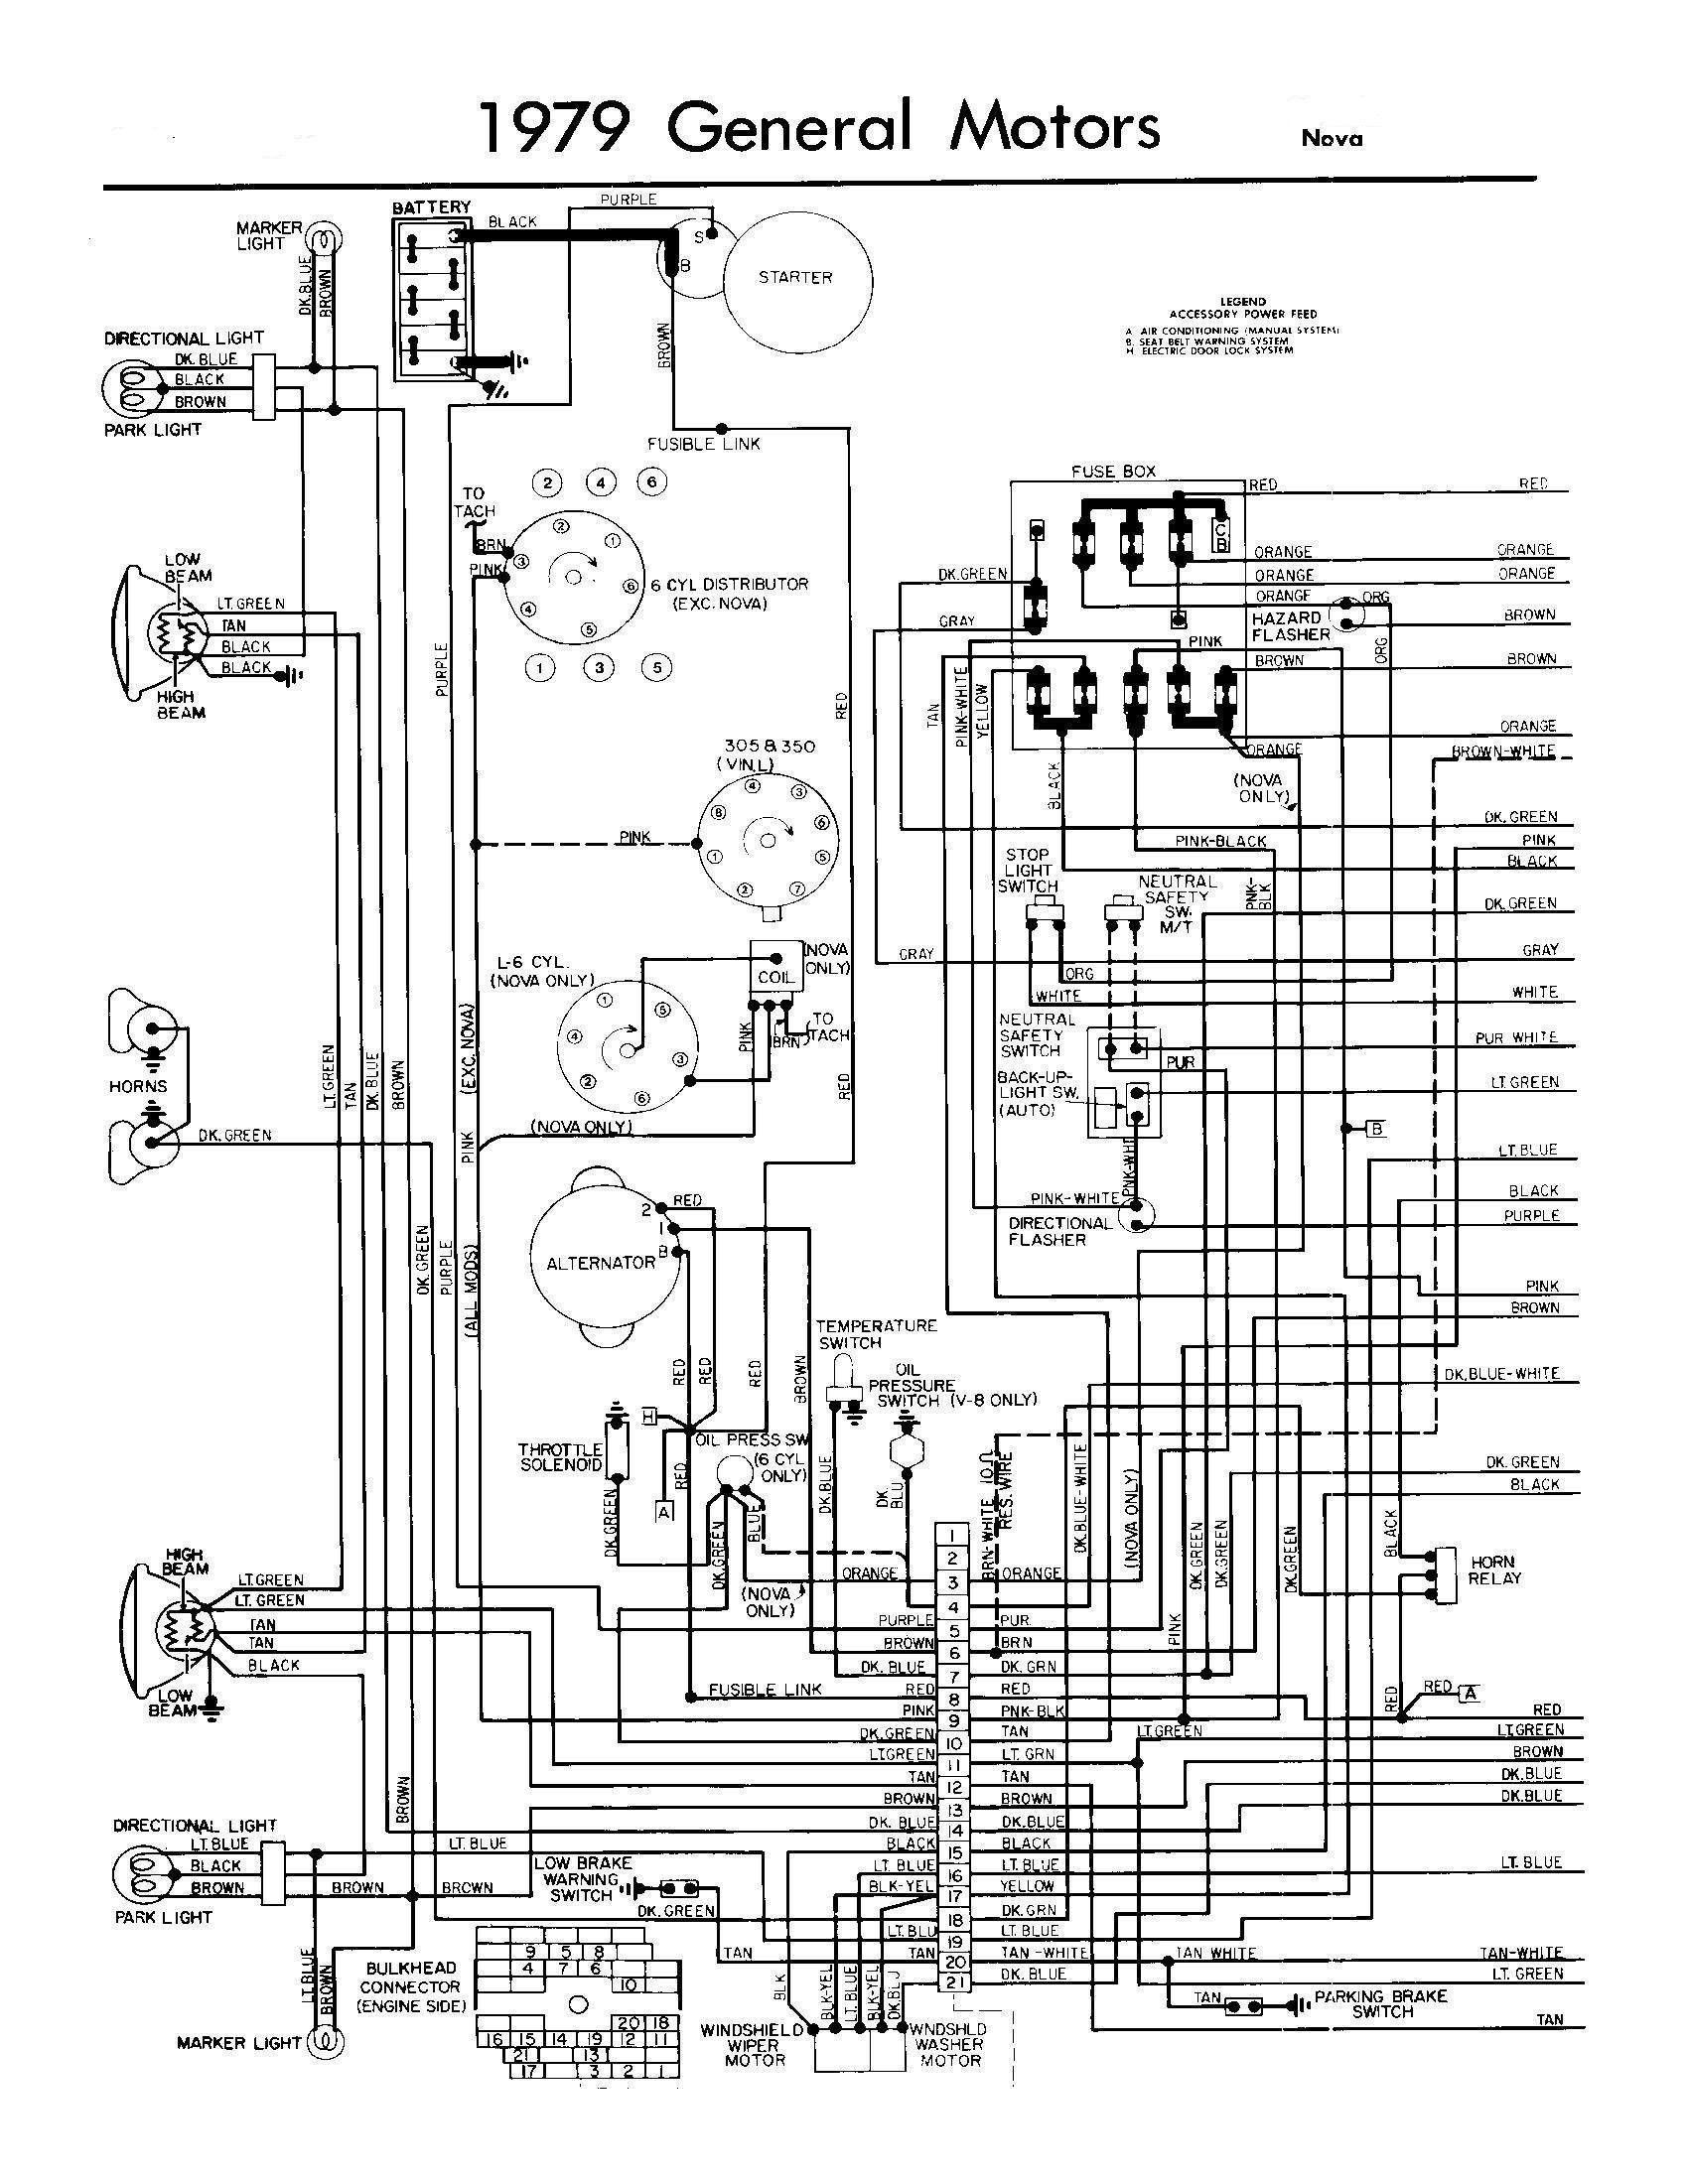 Toyota 22r Engine Diagram 1989 toyota Van Engine Diagram Wiring Diagram Datasource Of Toyota 22r Engine Diagram toyota Engine Schematics Wiring Diagram Paper